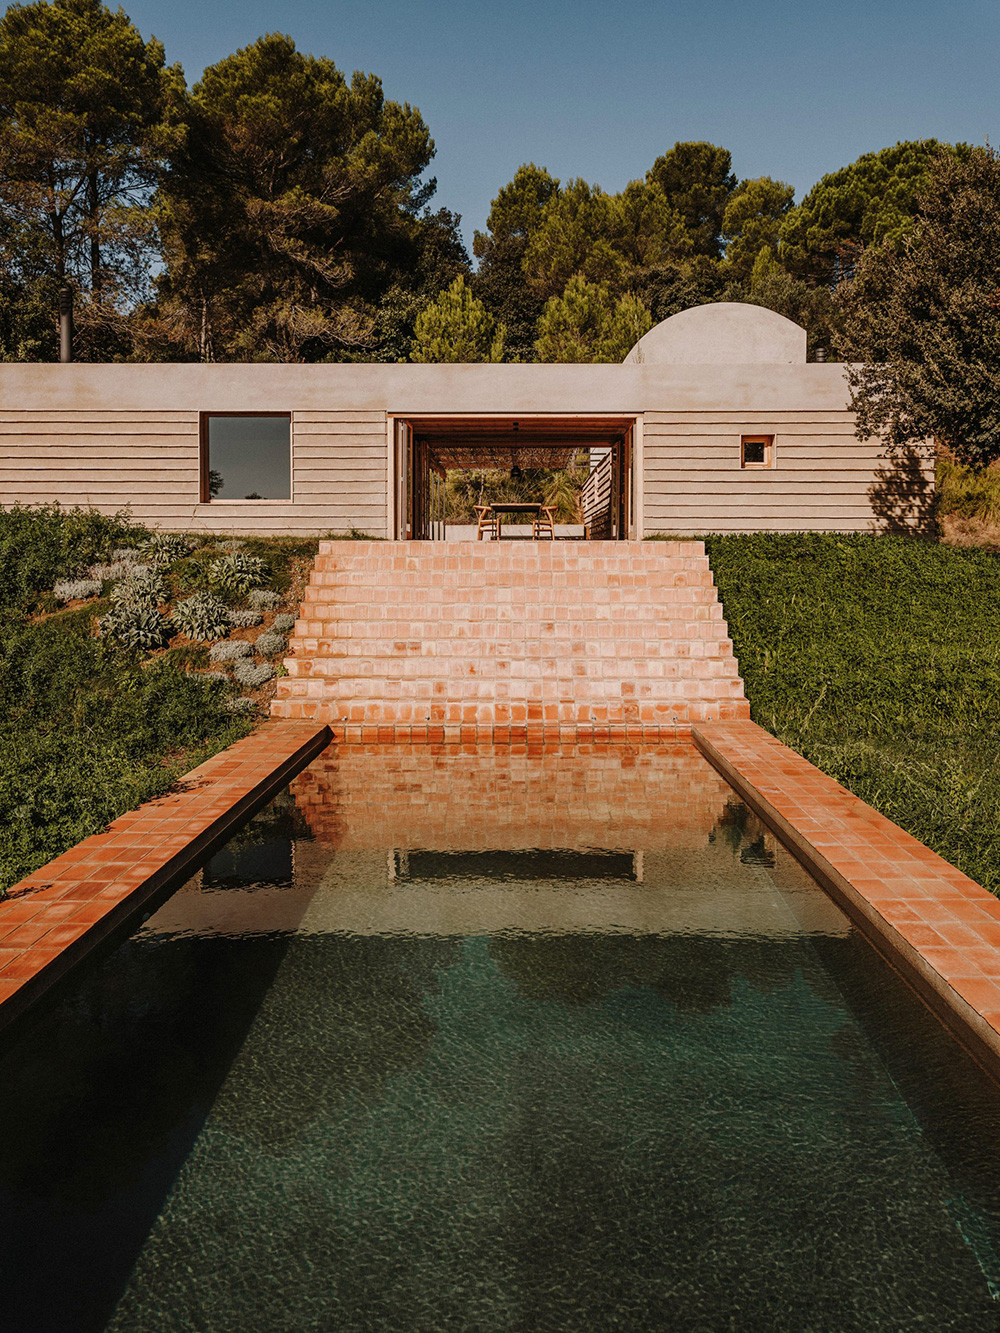 Tile of Spain Awards 2021 победители фото